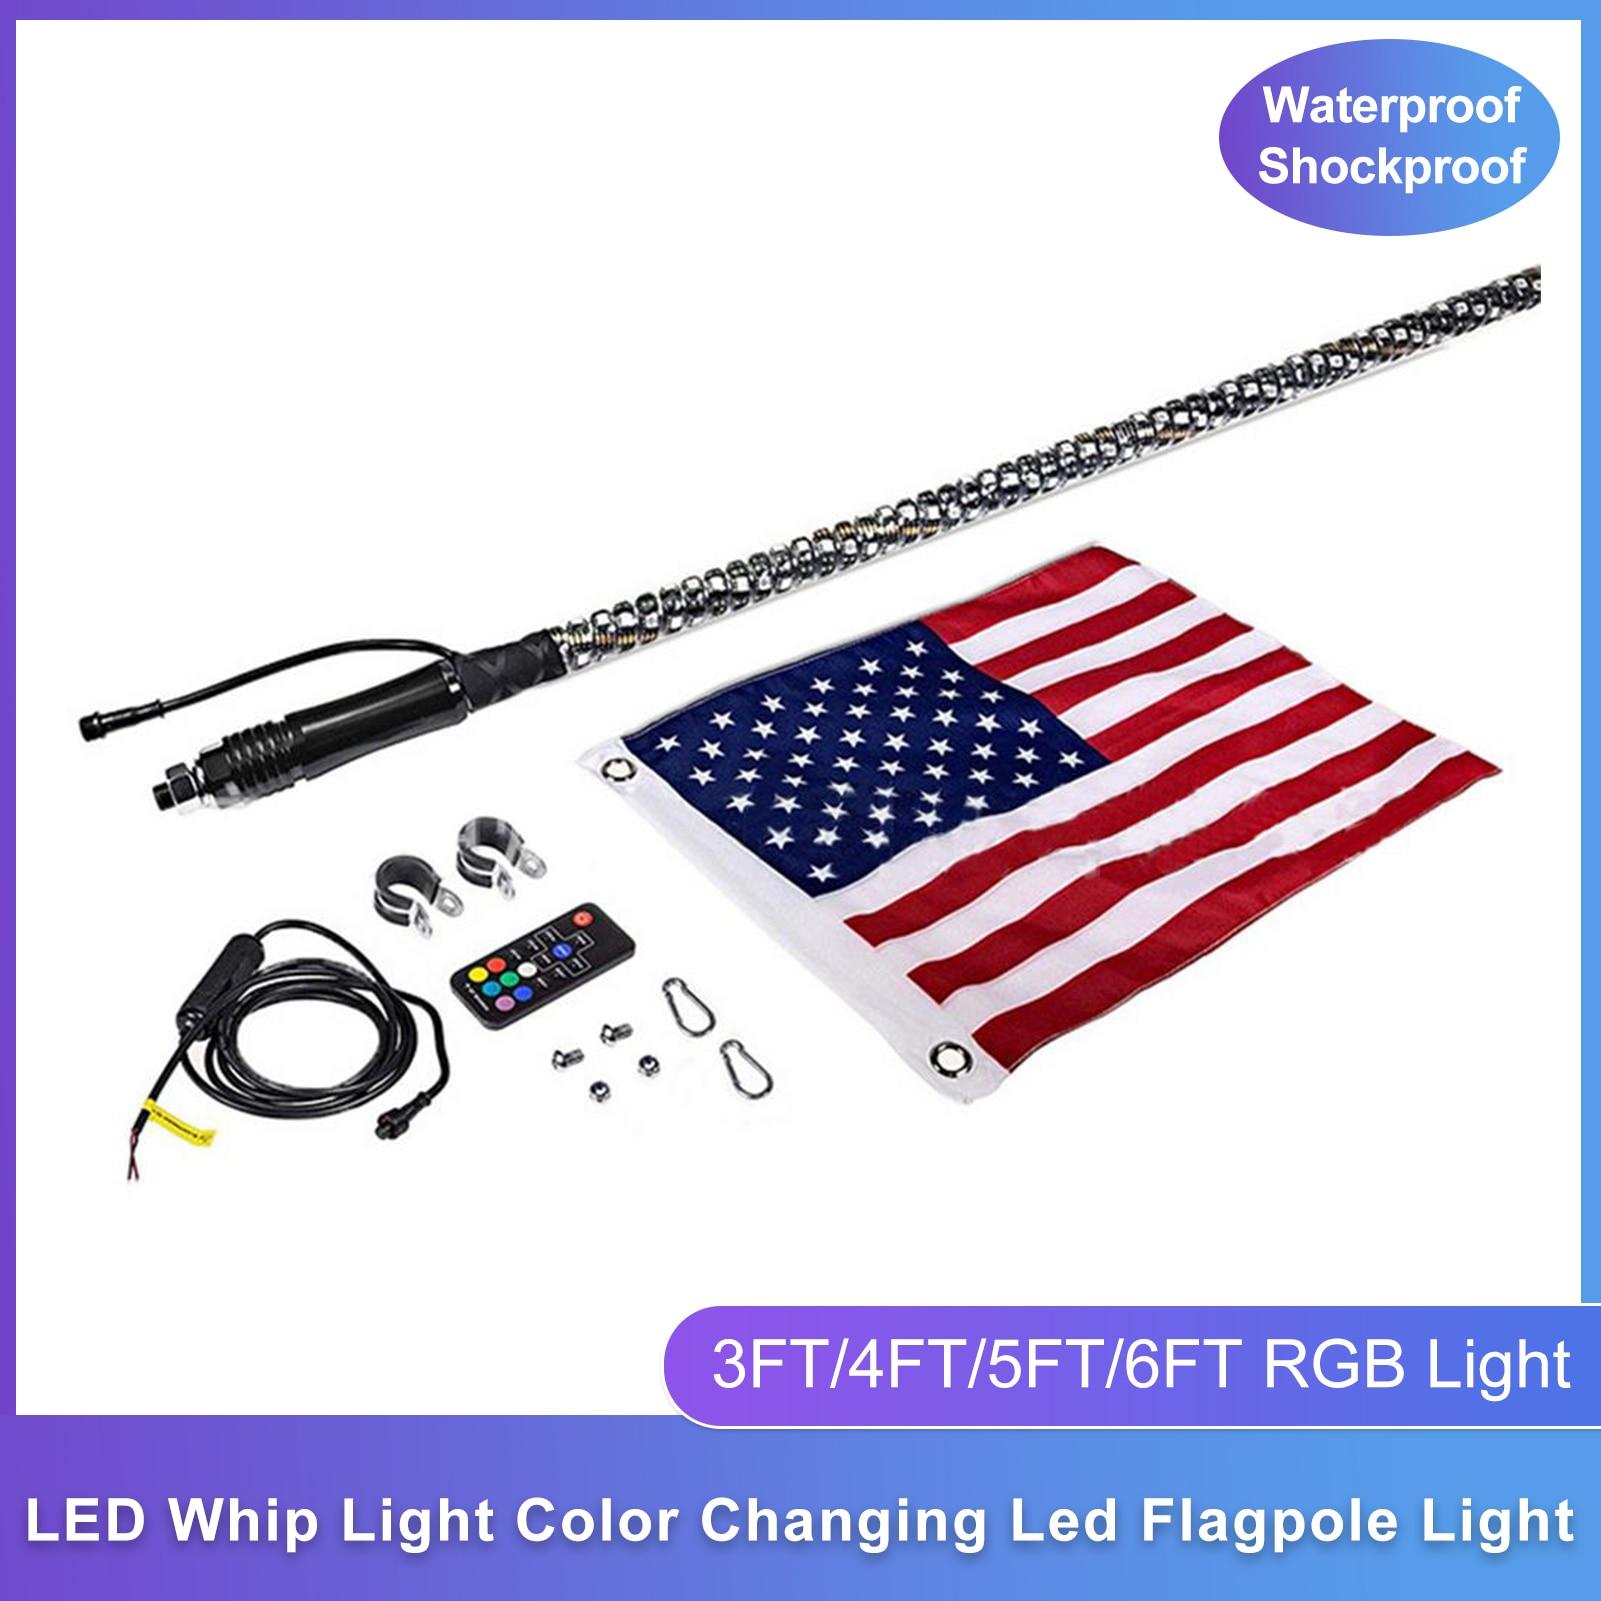 LED Whip Light Waterproof Dustproof Shockproof Flagpole Light 3FT/4FT/5FT/6FT RGB Off-road ATV Color